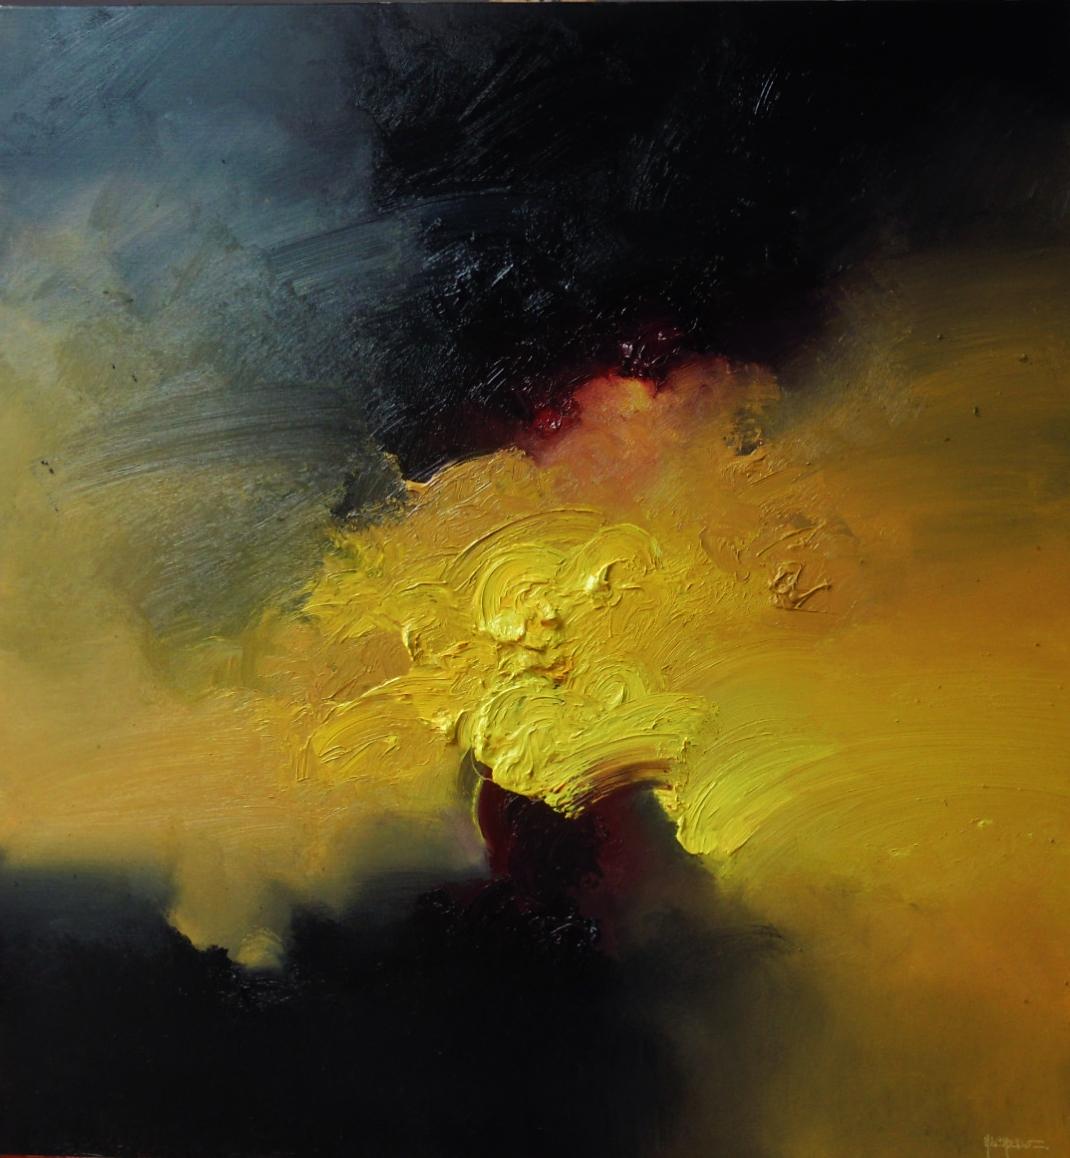 Kenofonyas (2015) - Emilio Machado